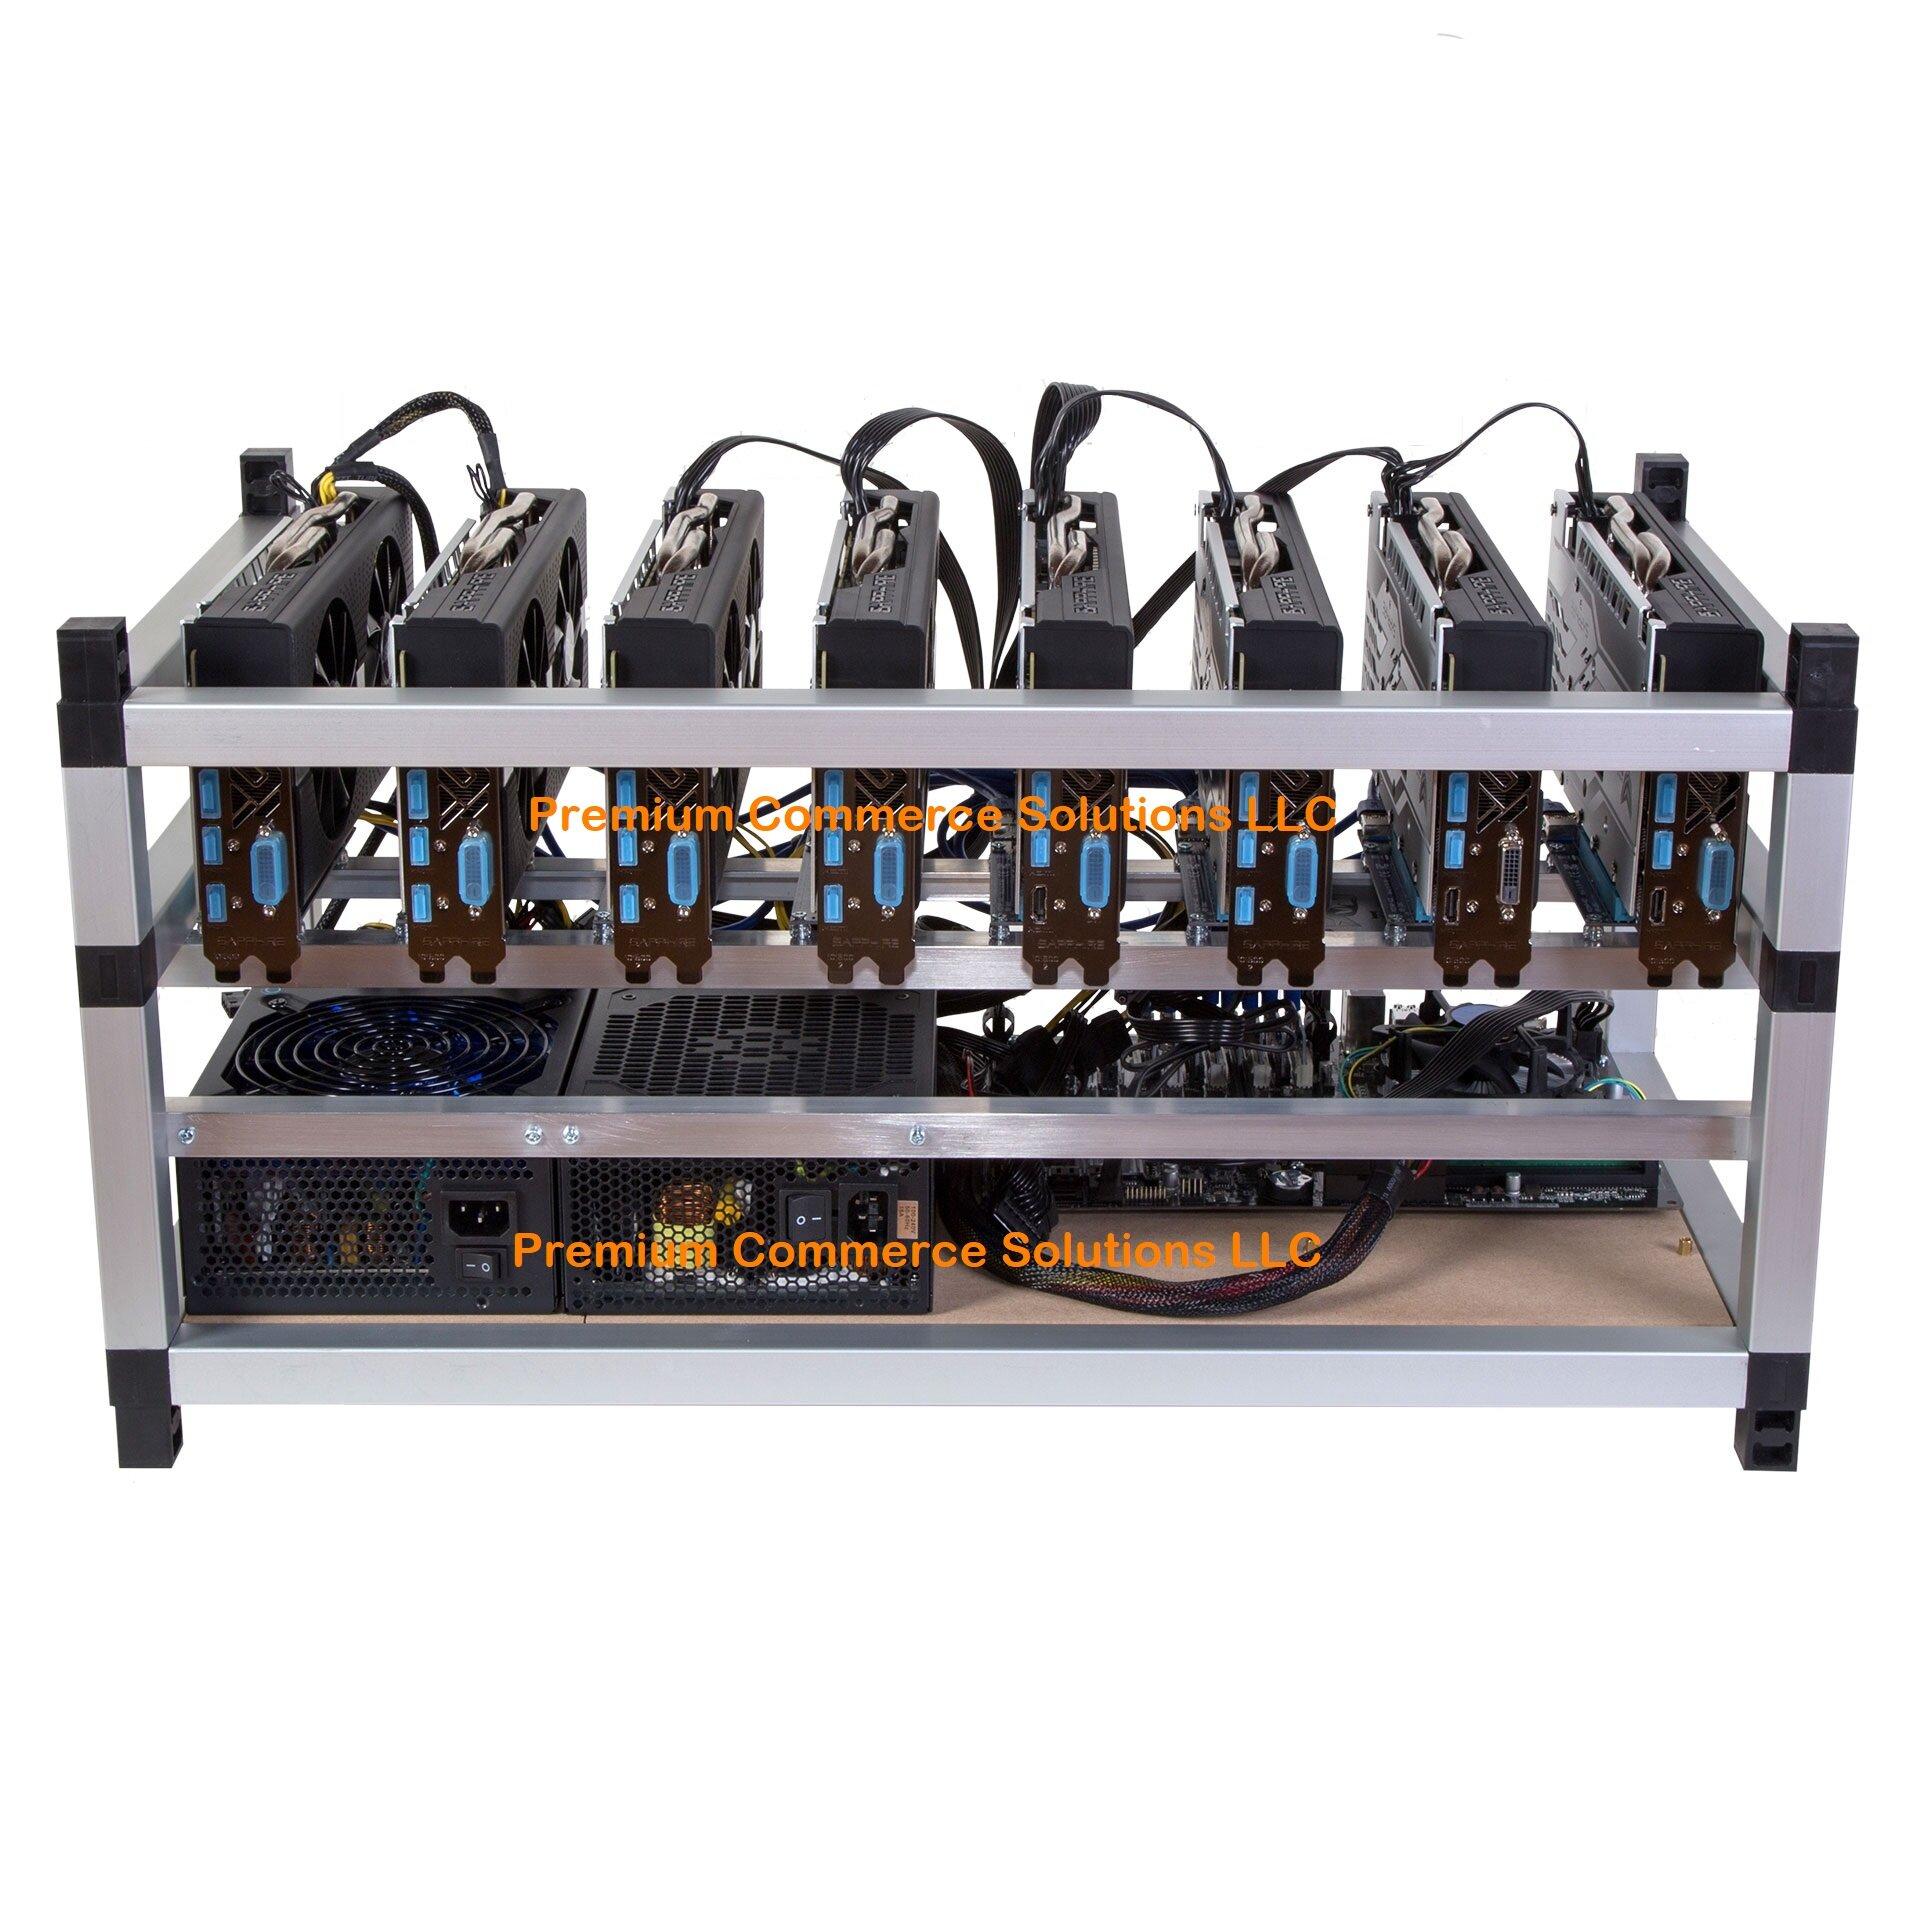 Supplier of bitcoin mining rig worldwide